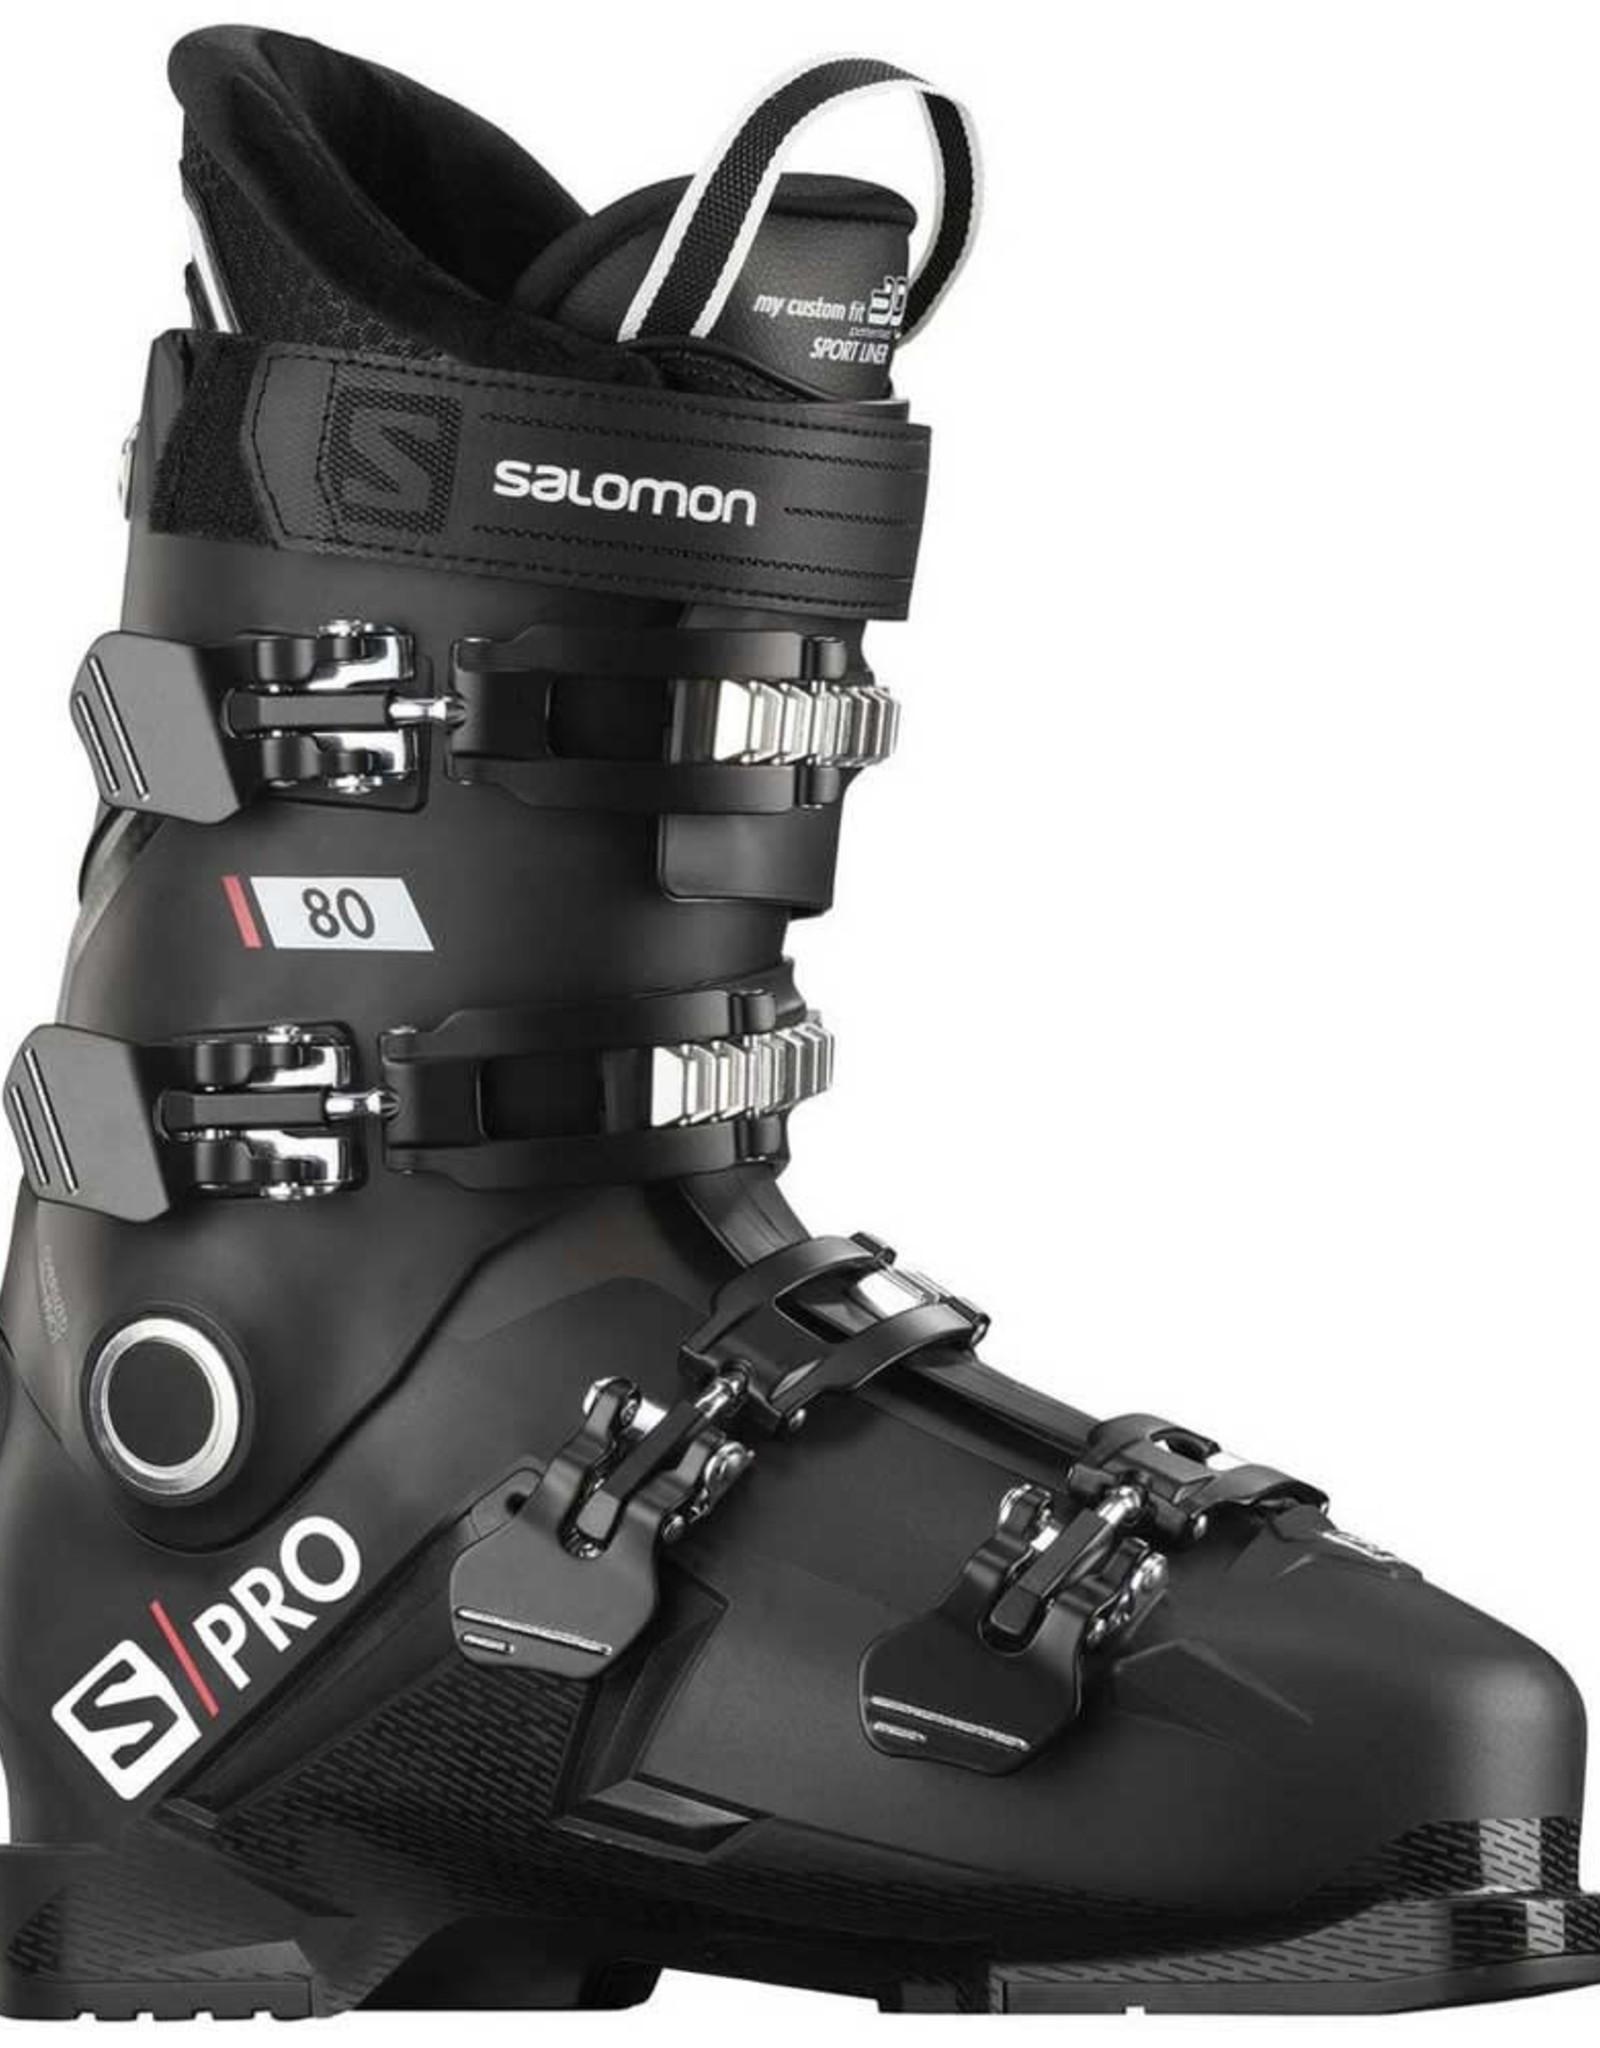 Salomon SALOMON Ski Boots S/PRO 80 (19/20)